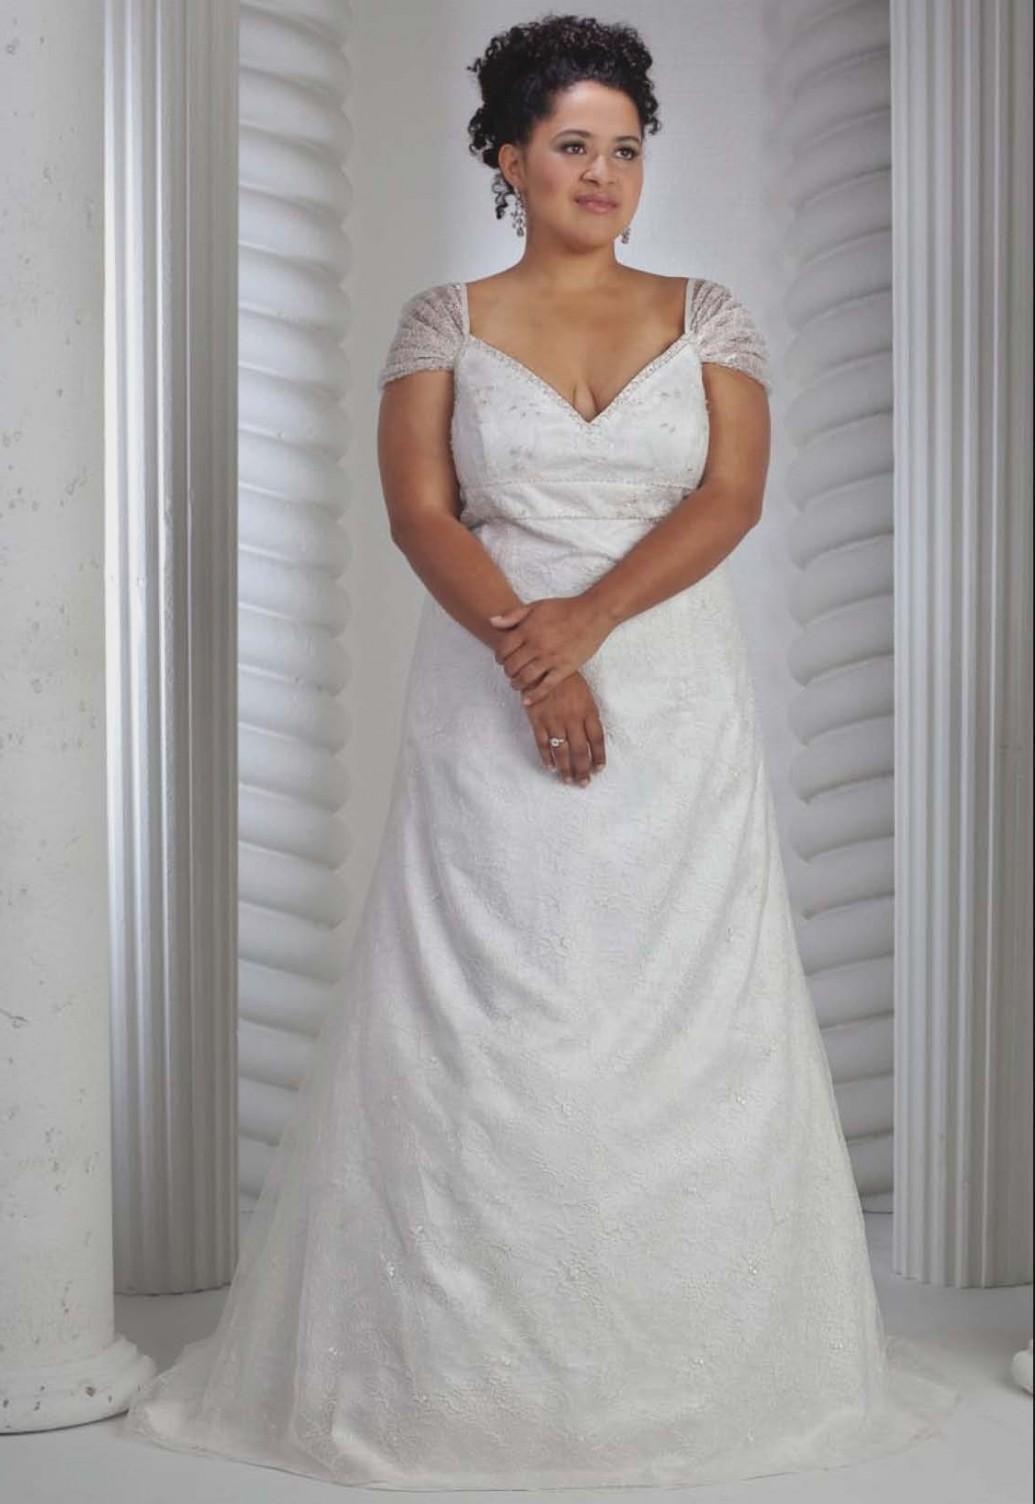 plus size wedding dresses san diego photo - 1